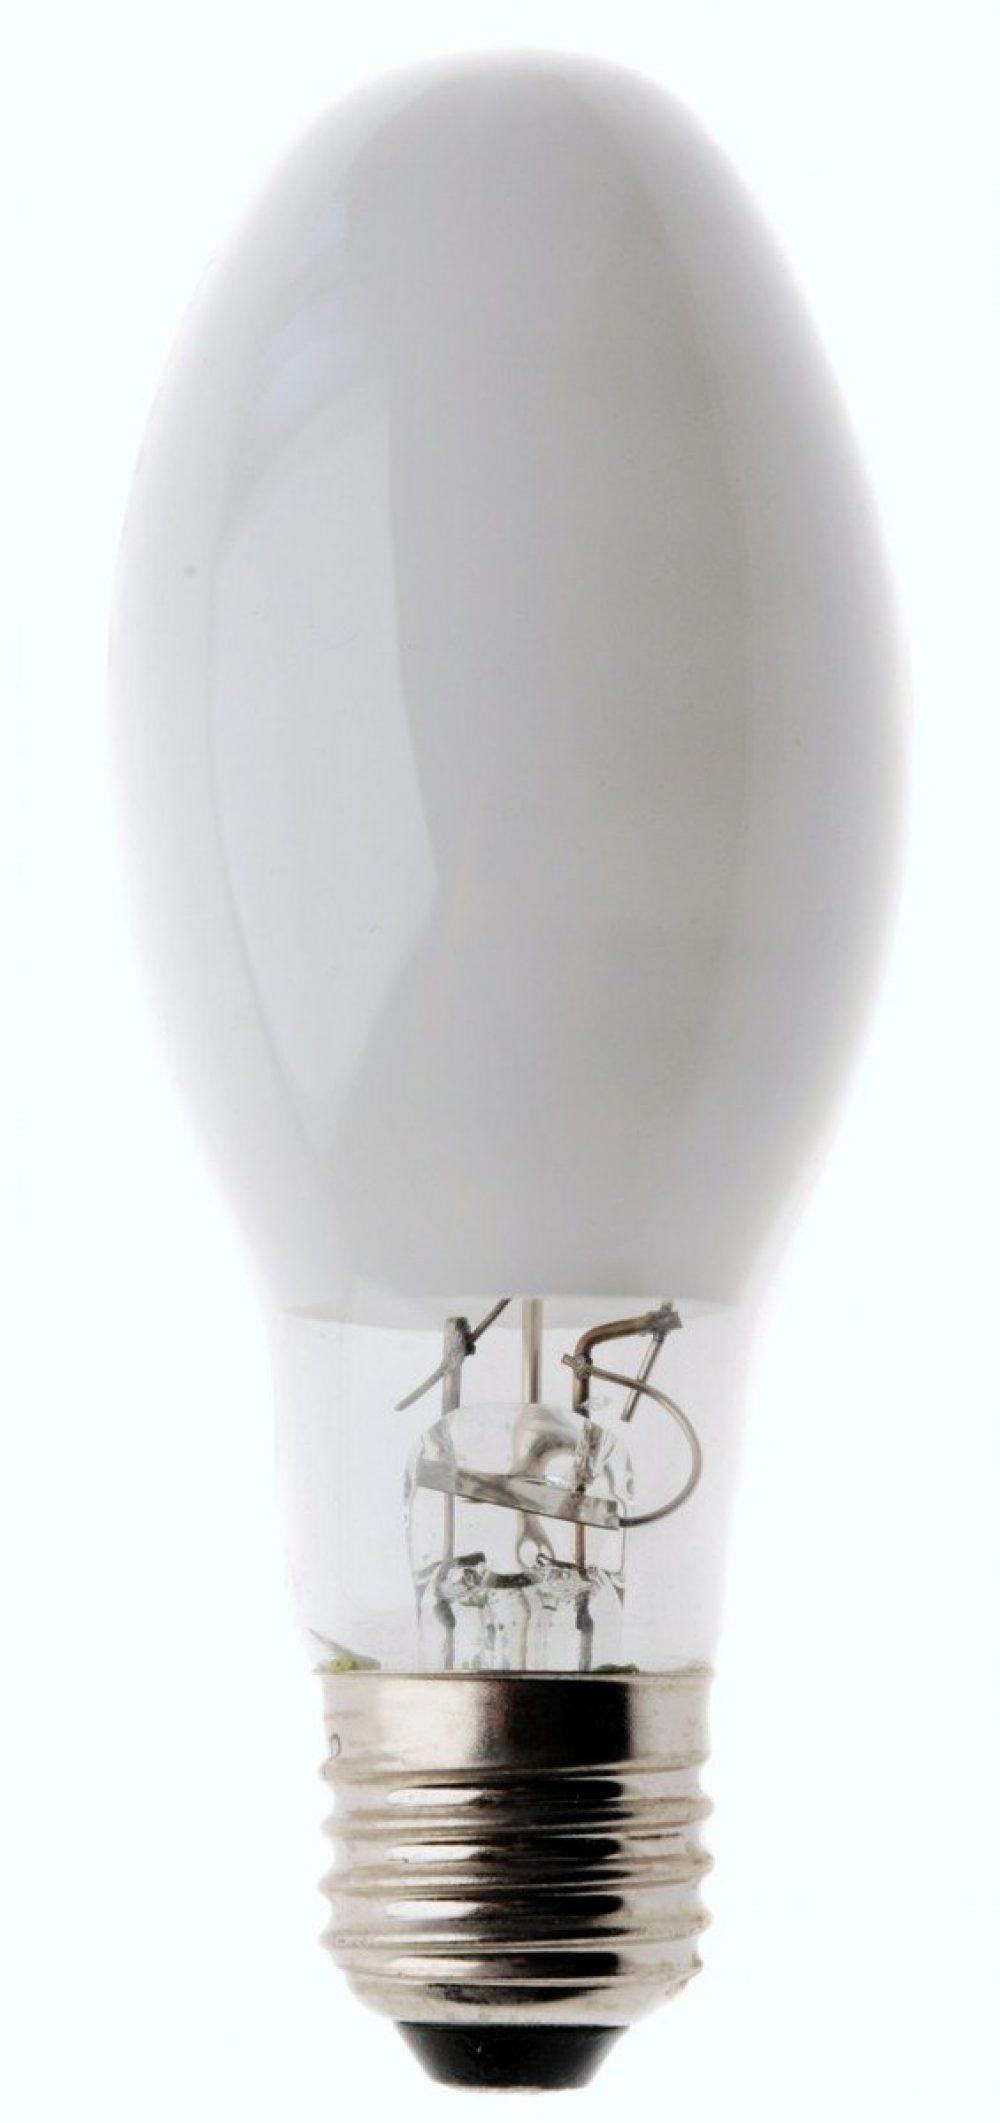 HID Metal Halide Lamps MP70W/ EDX54/ C/ U/ 3K/ E27/ COATED/ EUROPE